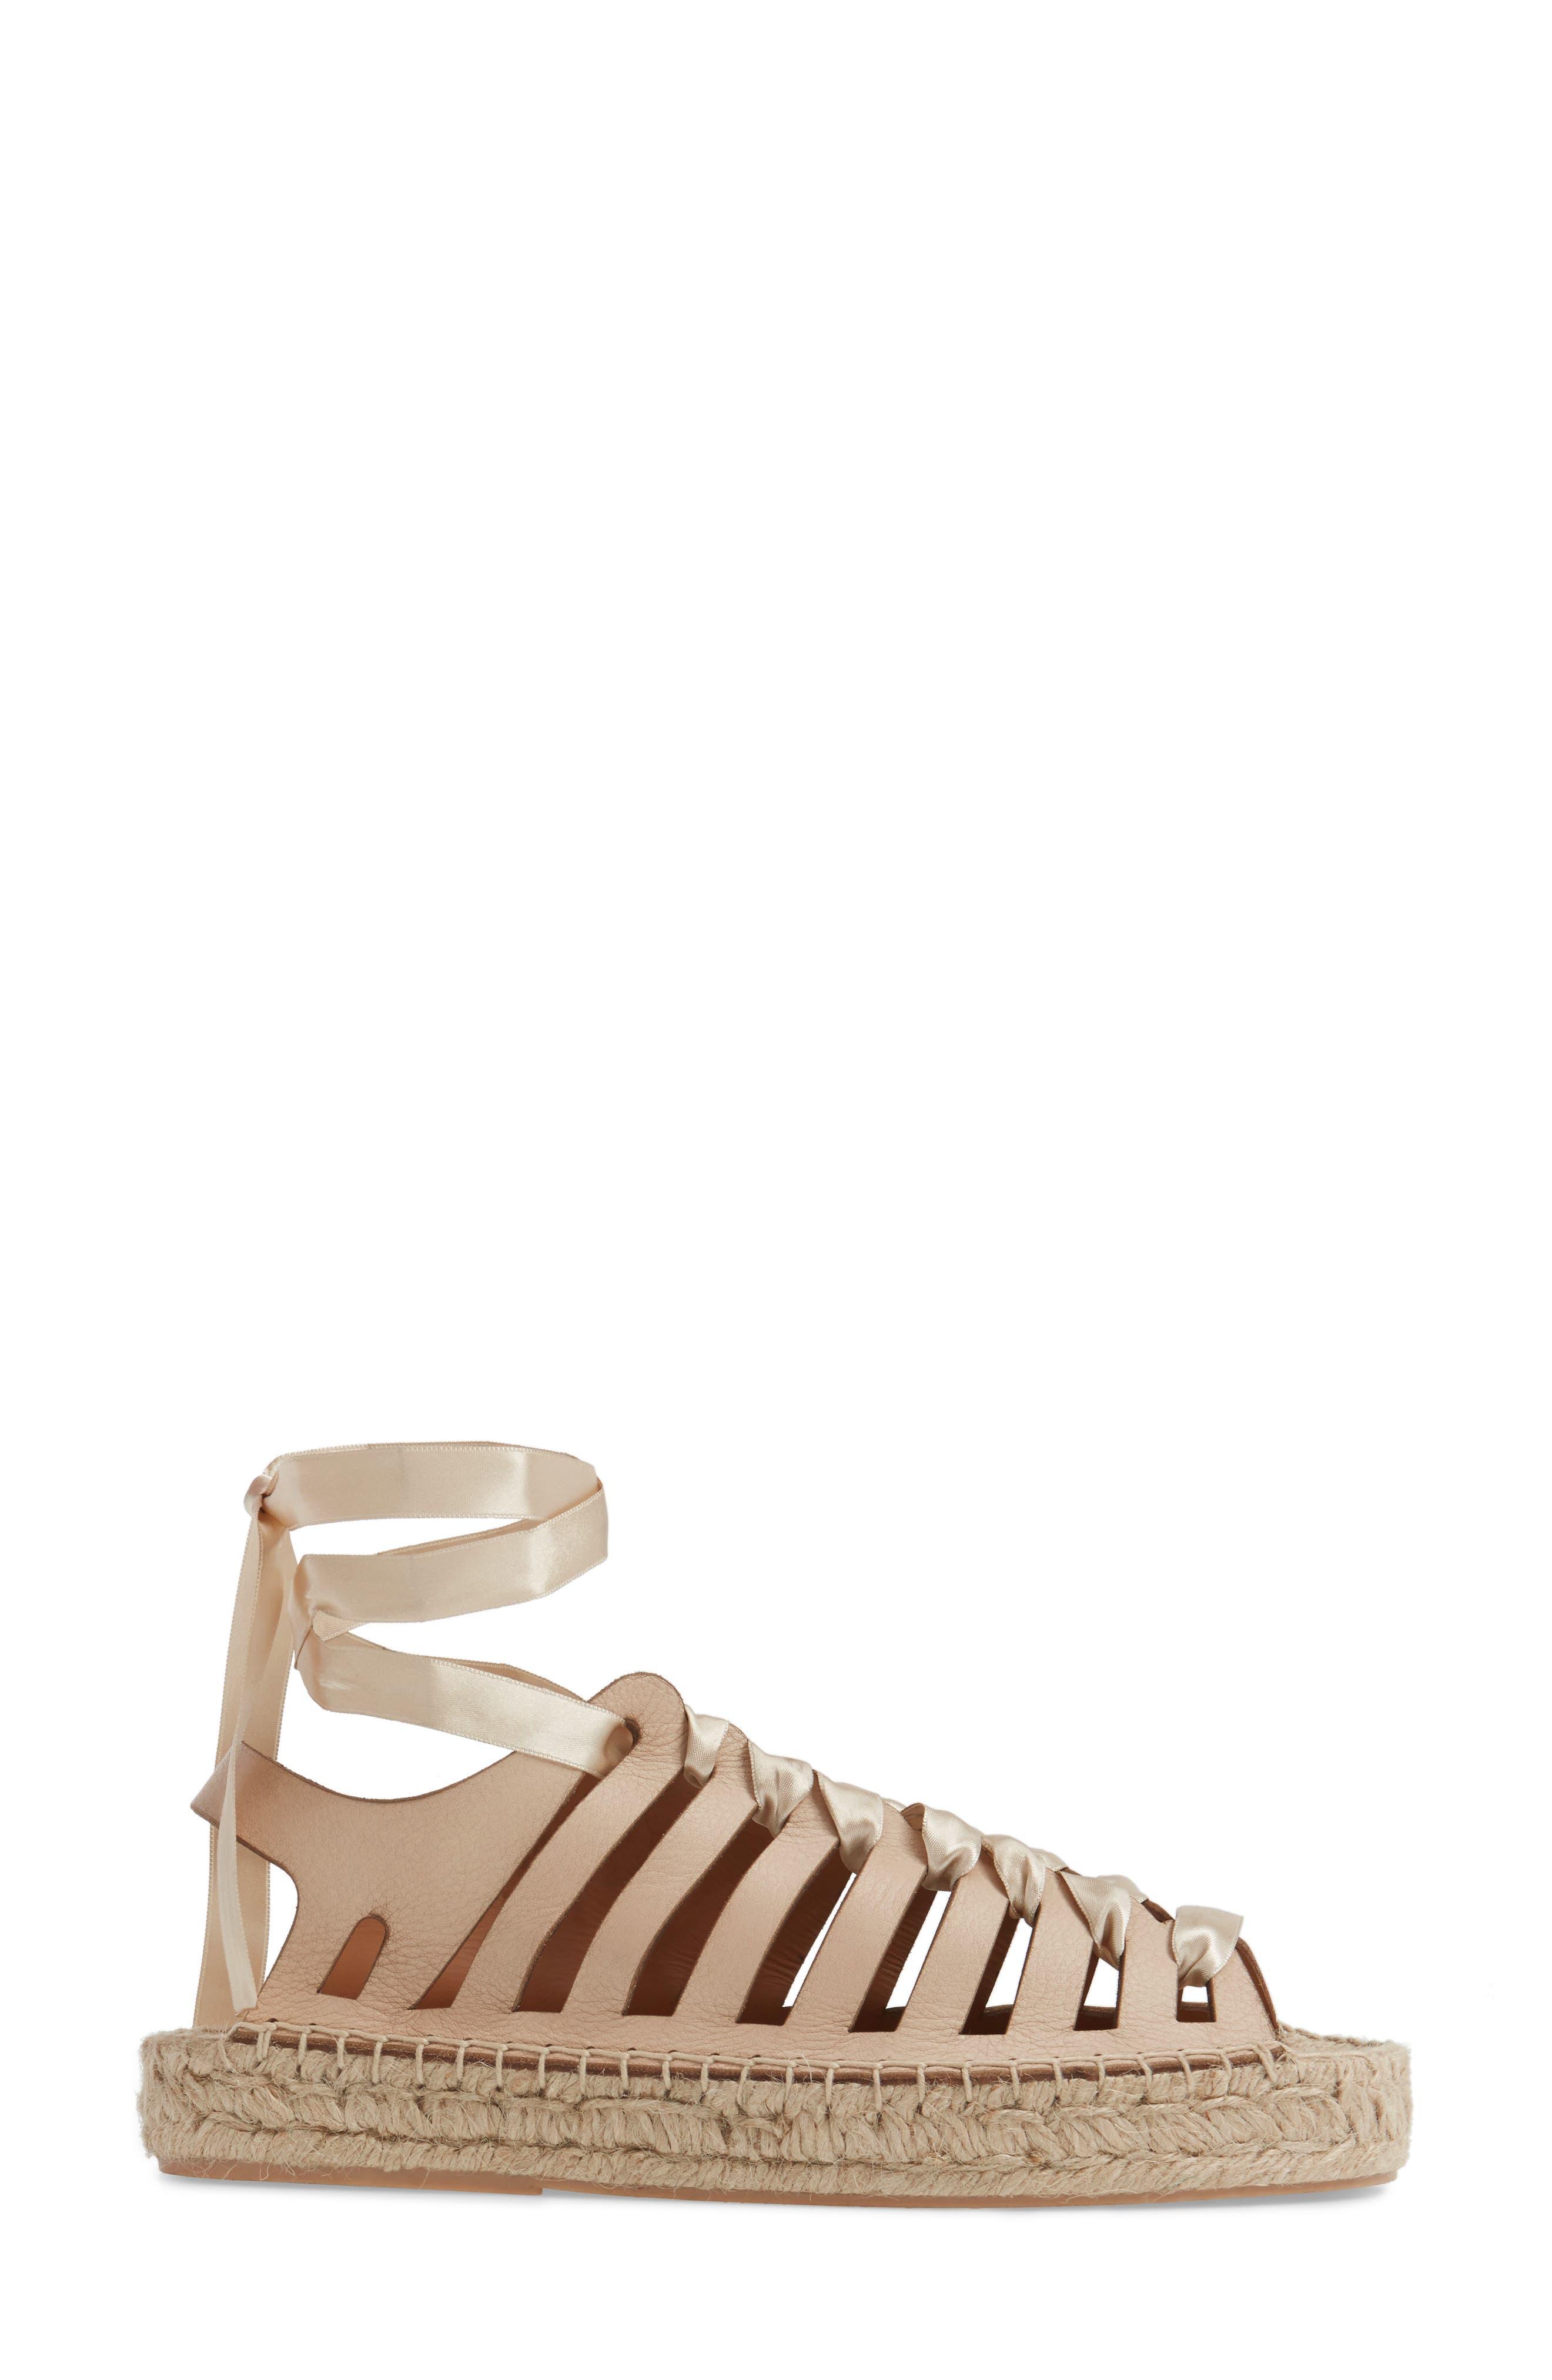 Krown Wraparound Platform Sandal,                             Alternate thumbnail 3, color,                             Nude Leather